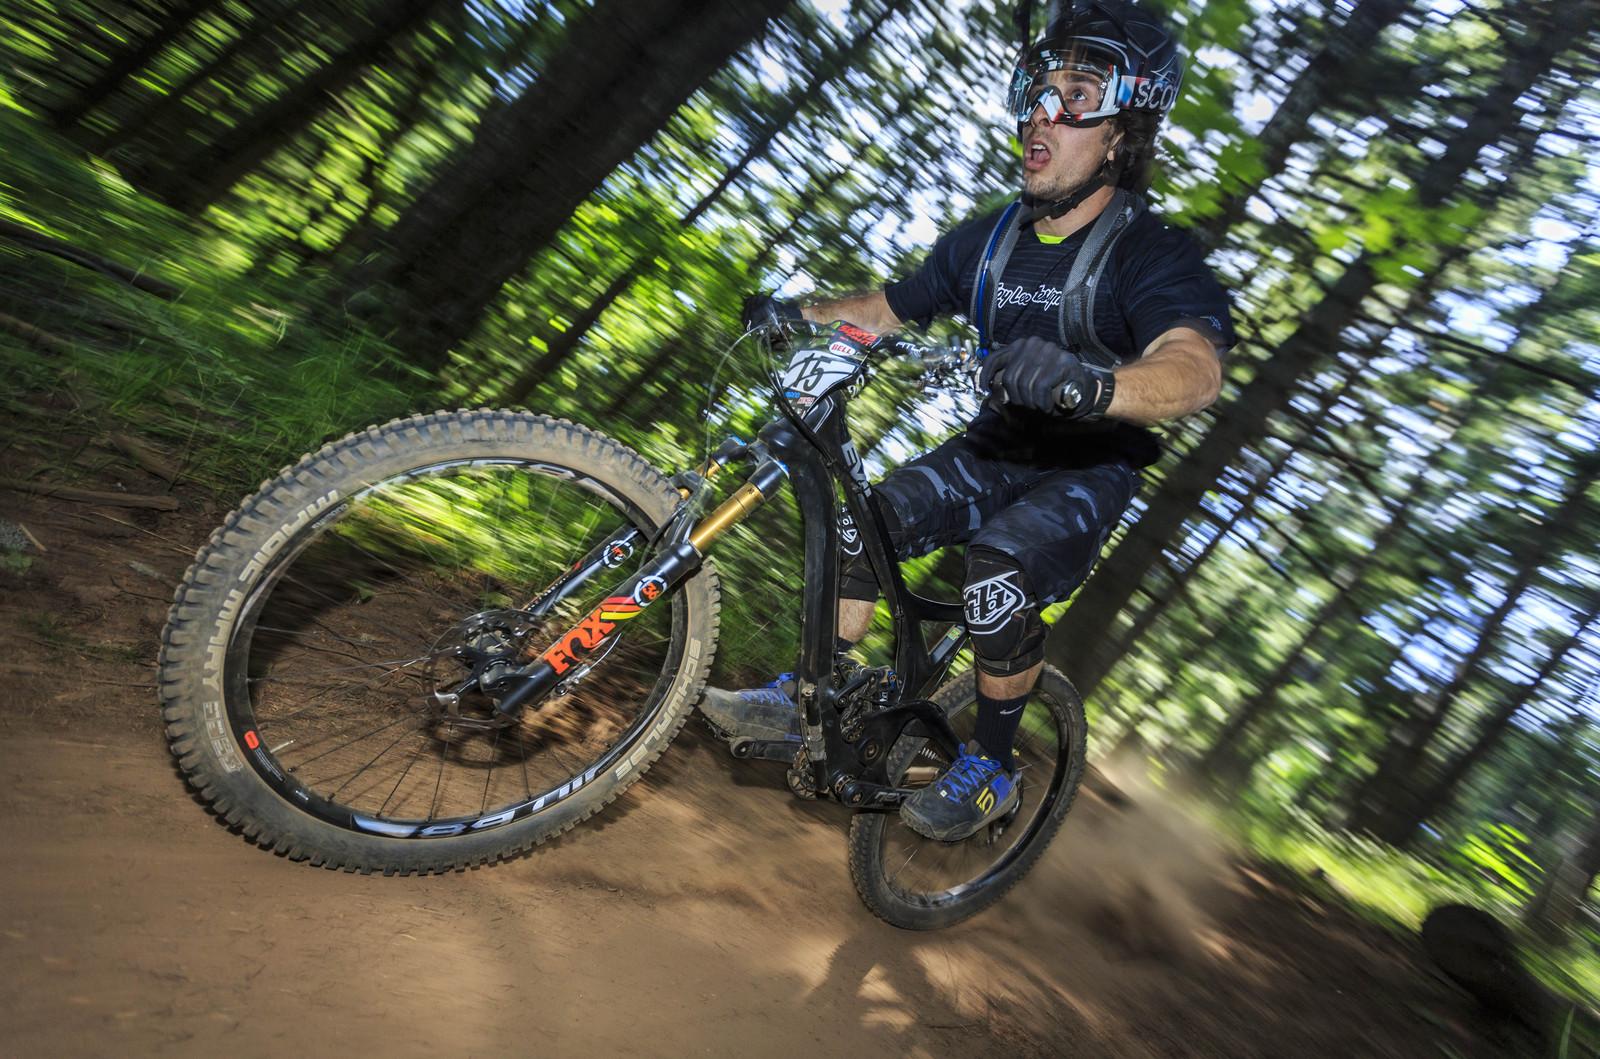 Luke Strobel - Oregon Enduro Series, Hood River - Oregon Enduro Hood River - Mountain Biking Pictures - Vital MTB